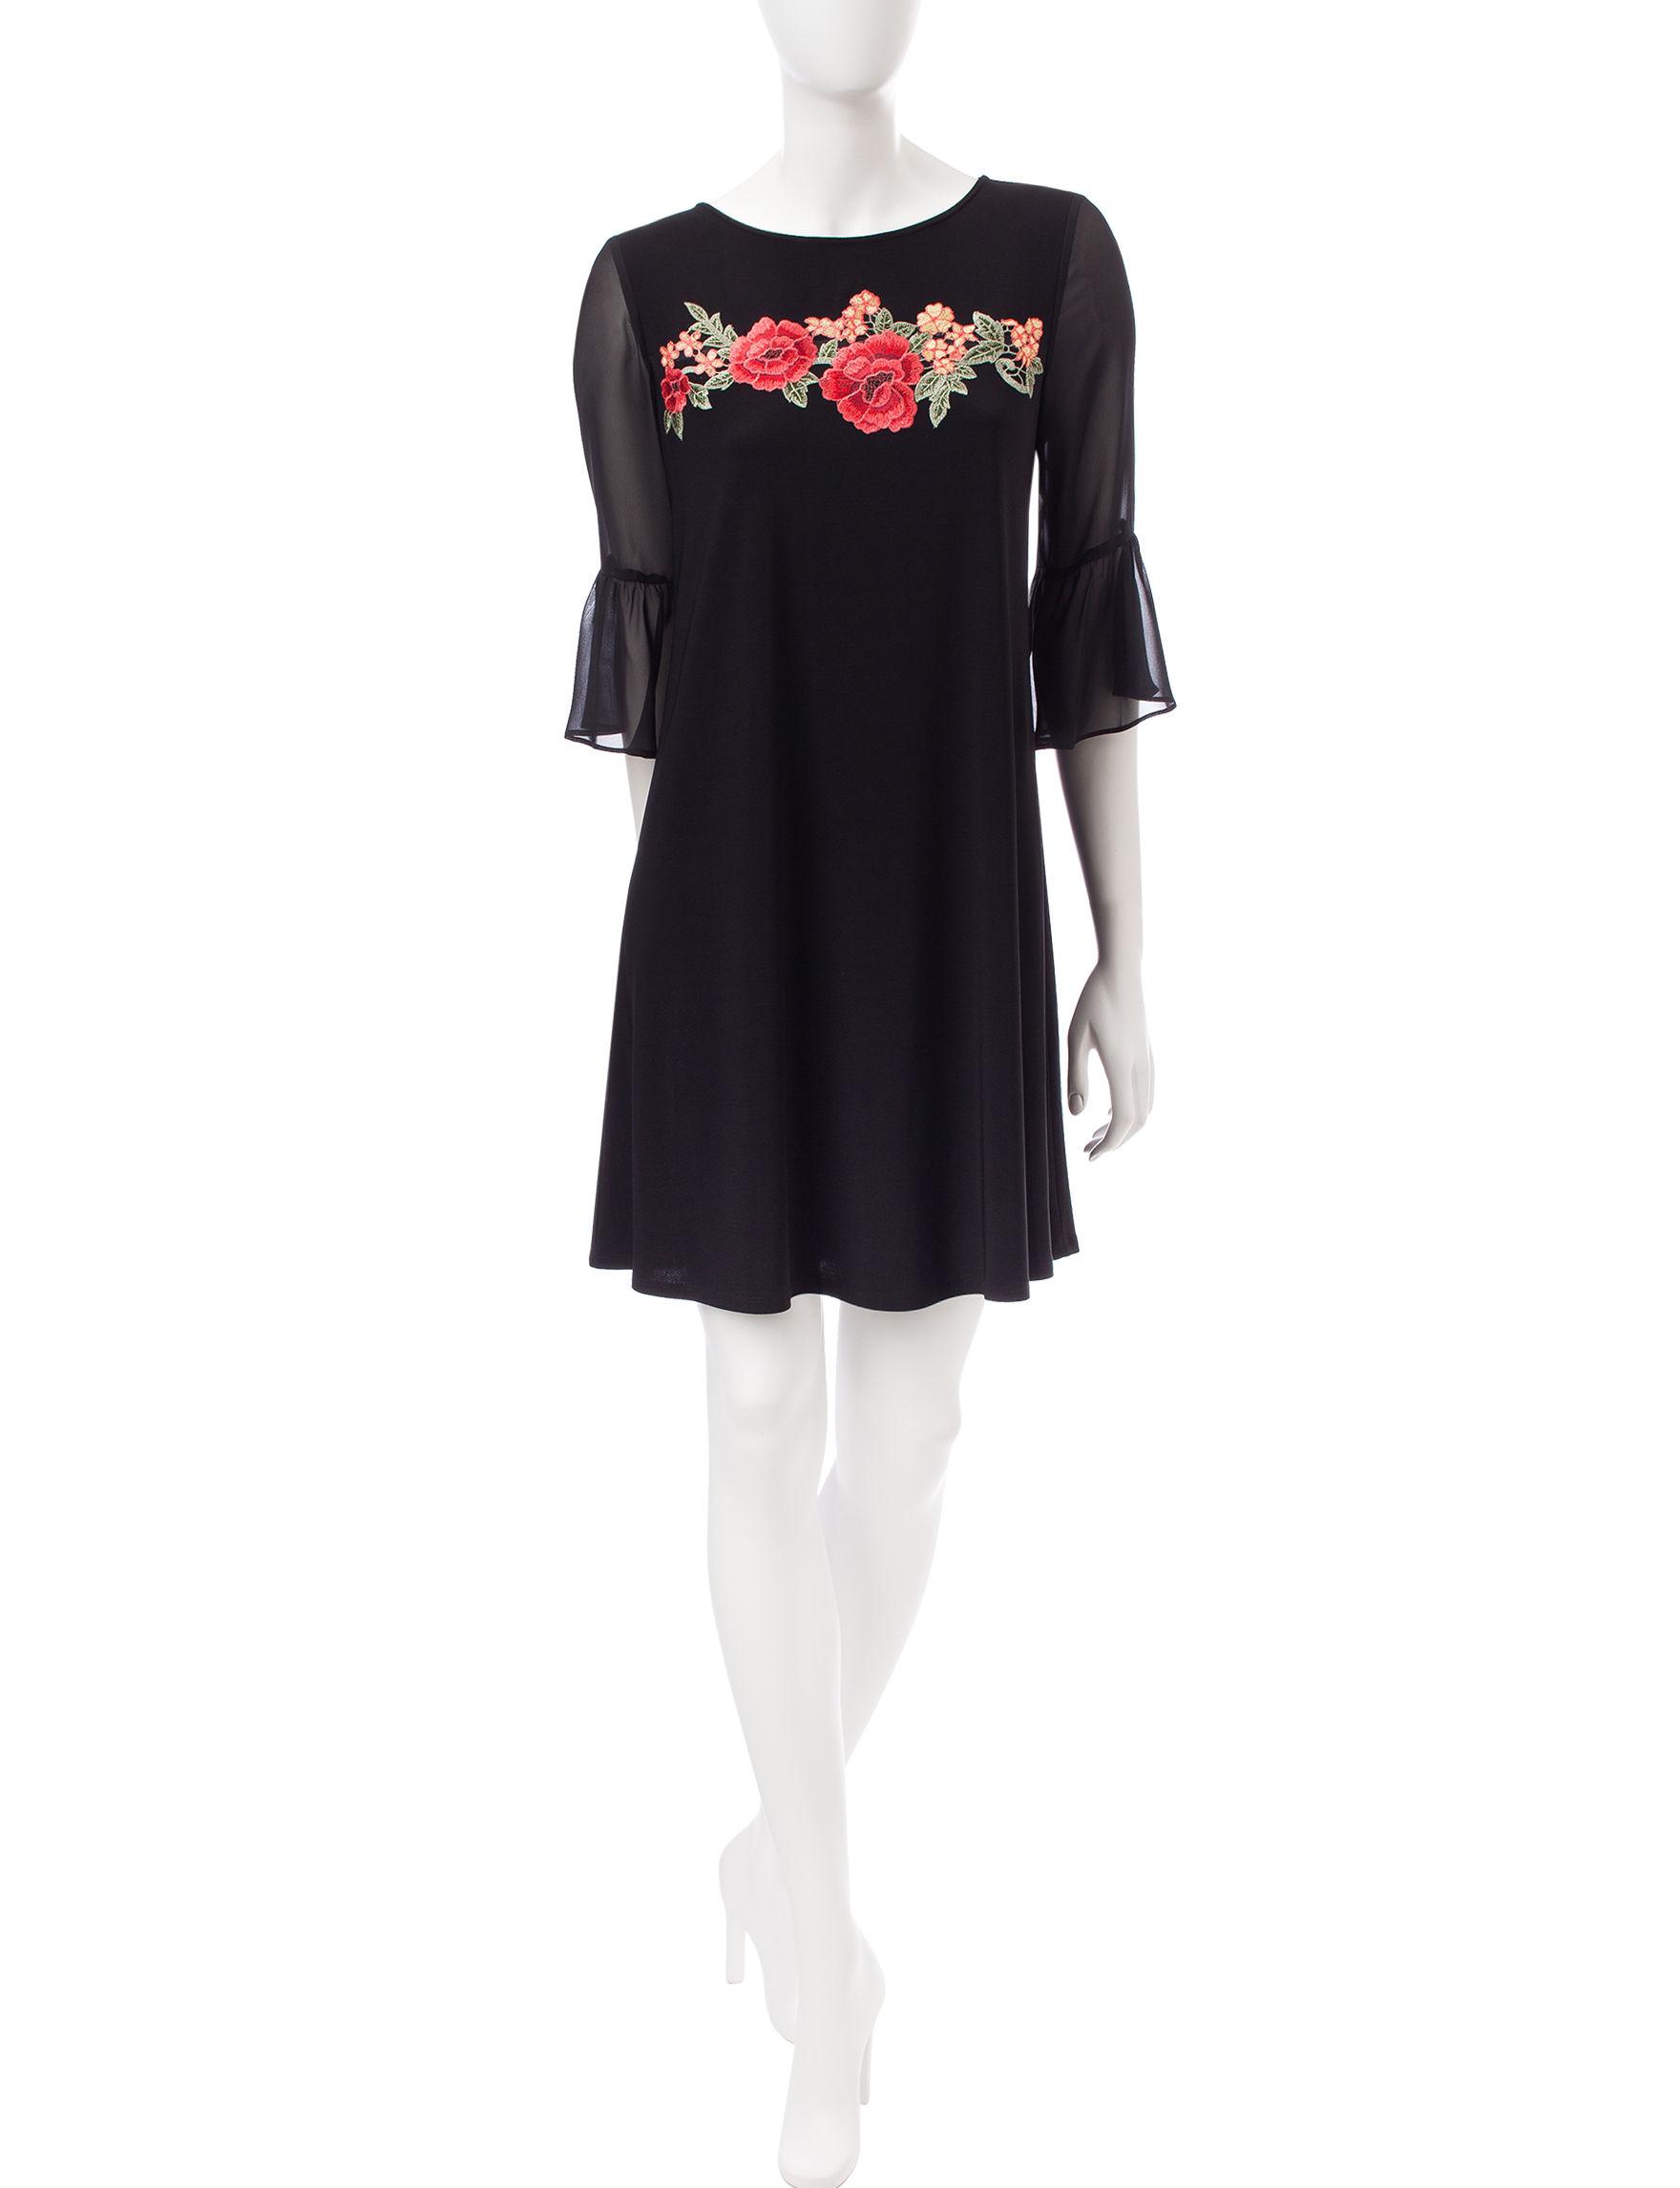 Perceptions Black Everyday & Casual A-line Dresses Shift Dresses